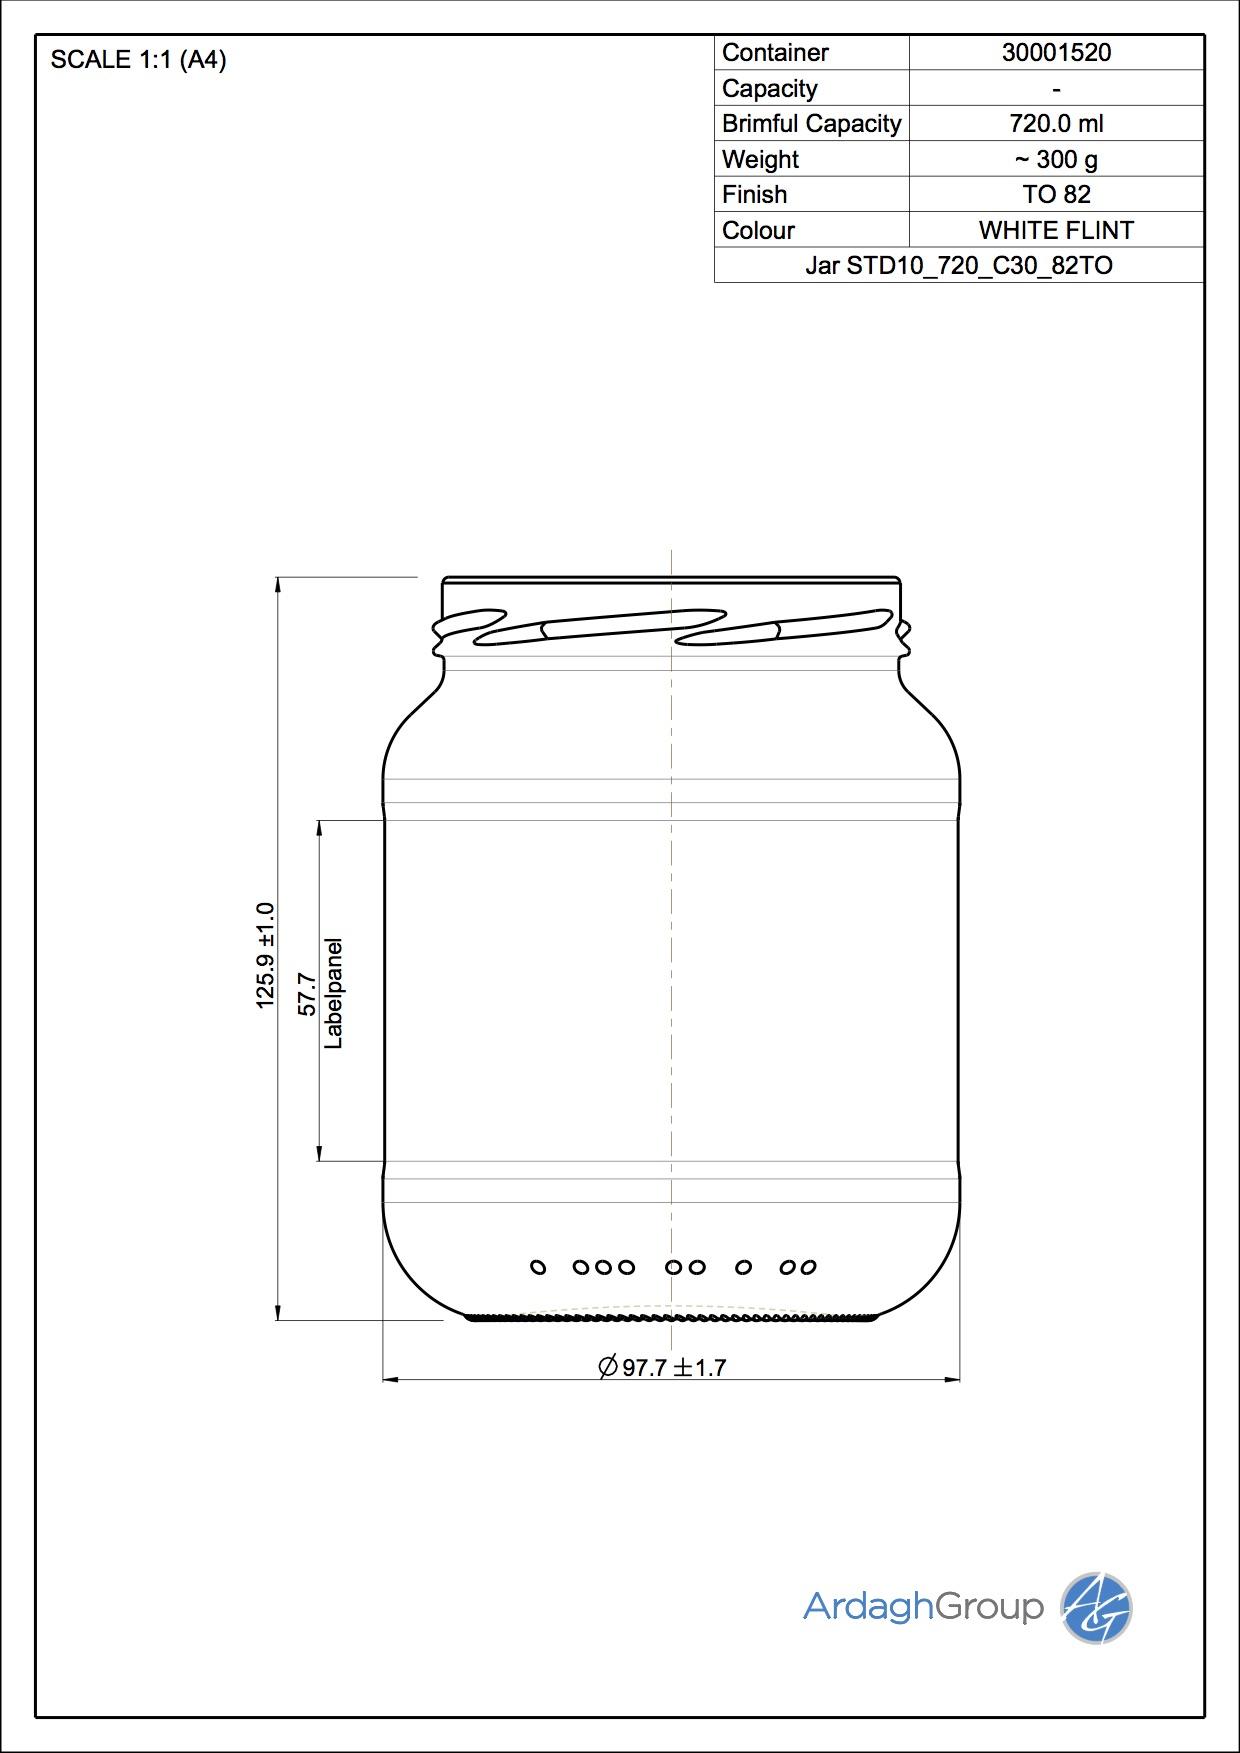 Jar STD10 720 C30 82TO